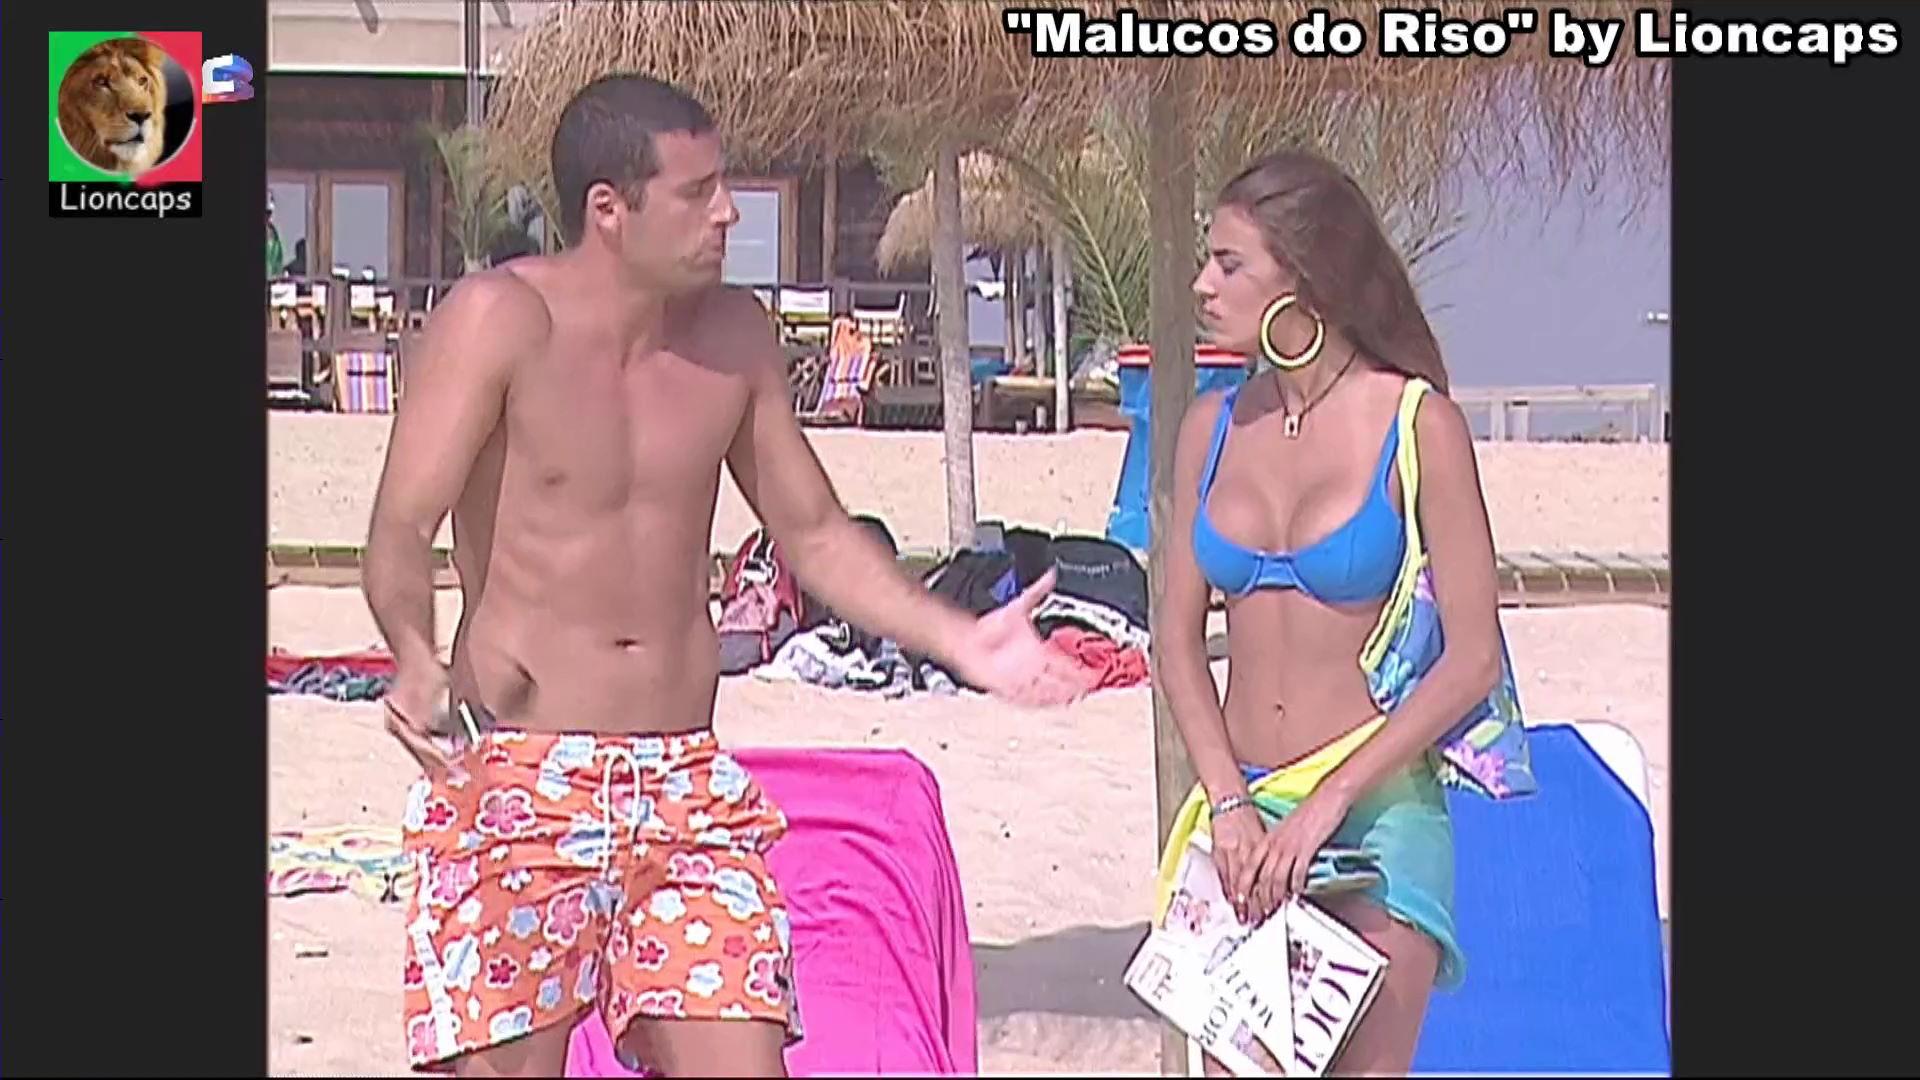 475132149_malucos_riso_alda_gomes_vs190malucos_riso_602_15051_122_360lo.JPG